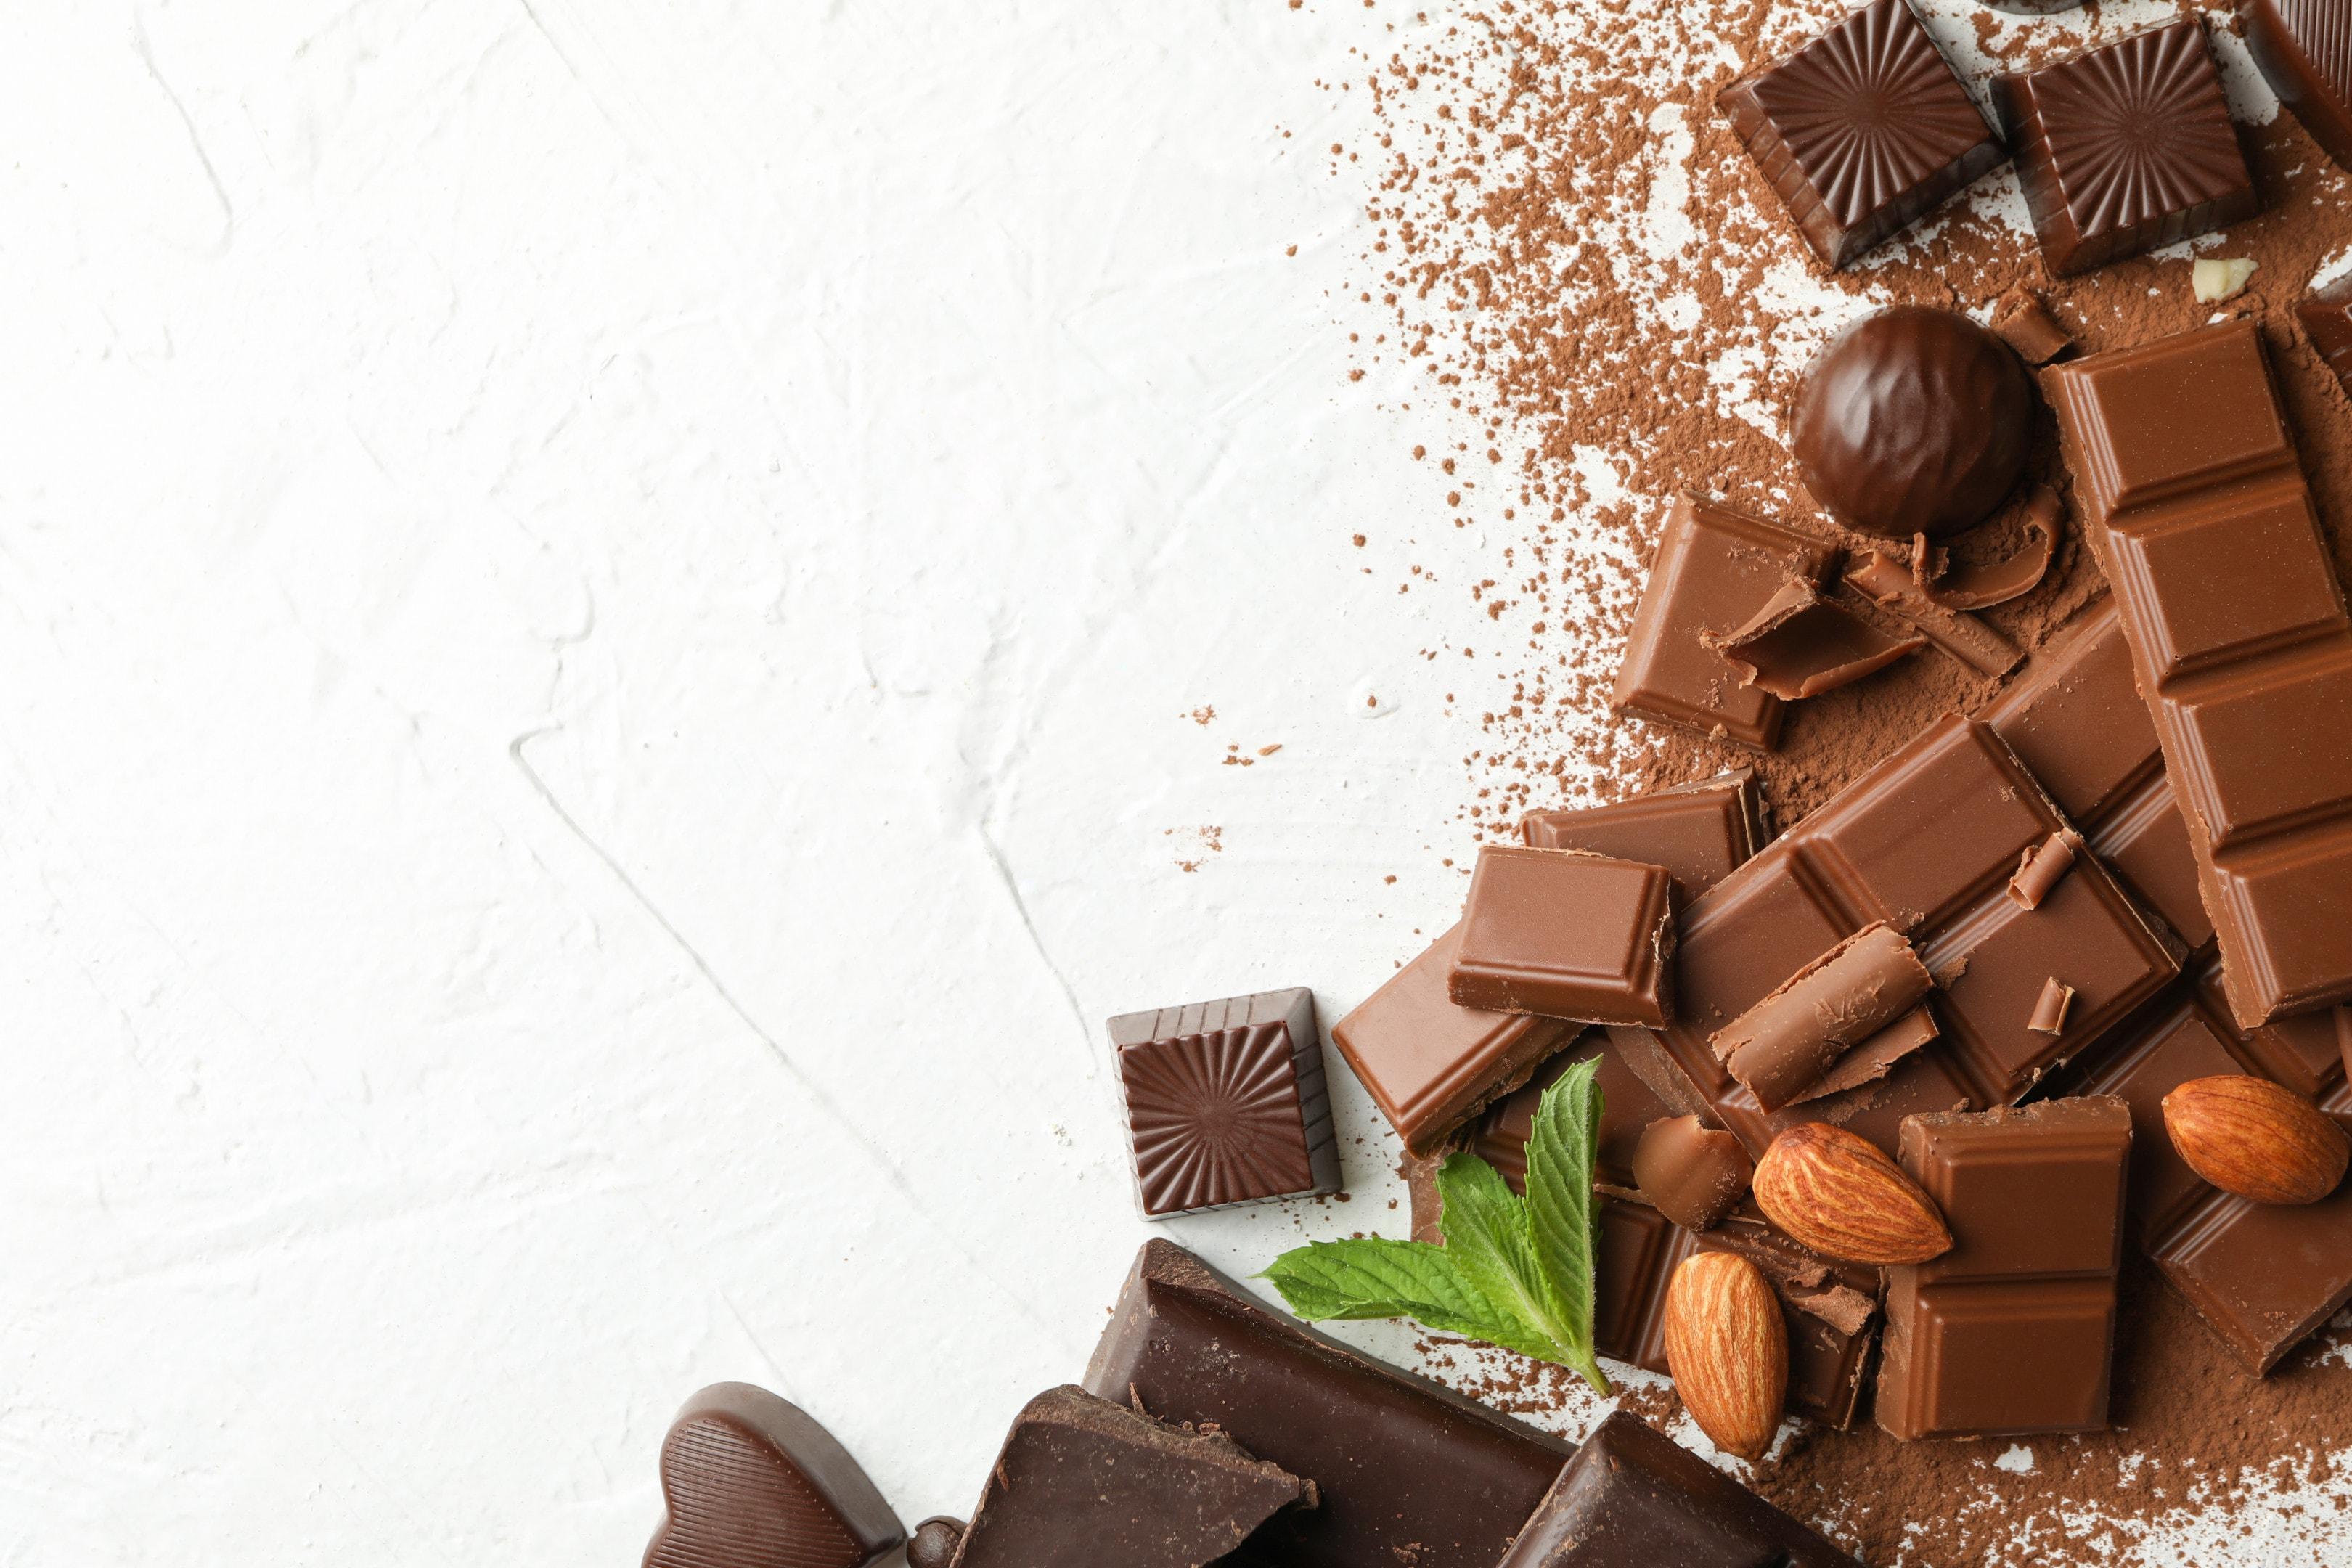 Milk chocolate and dark chocolate with almonds on white background